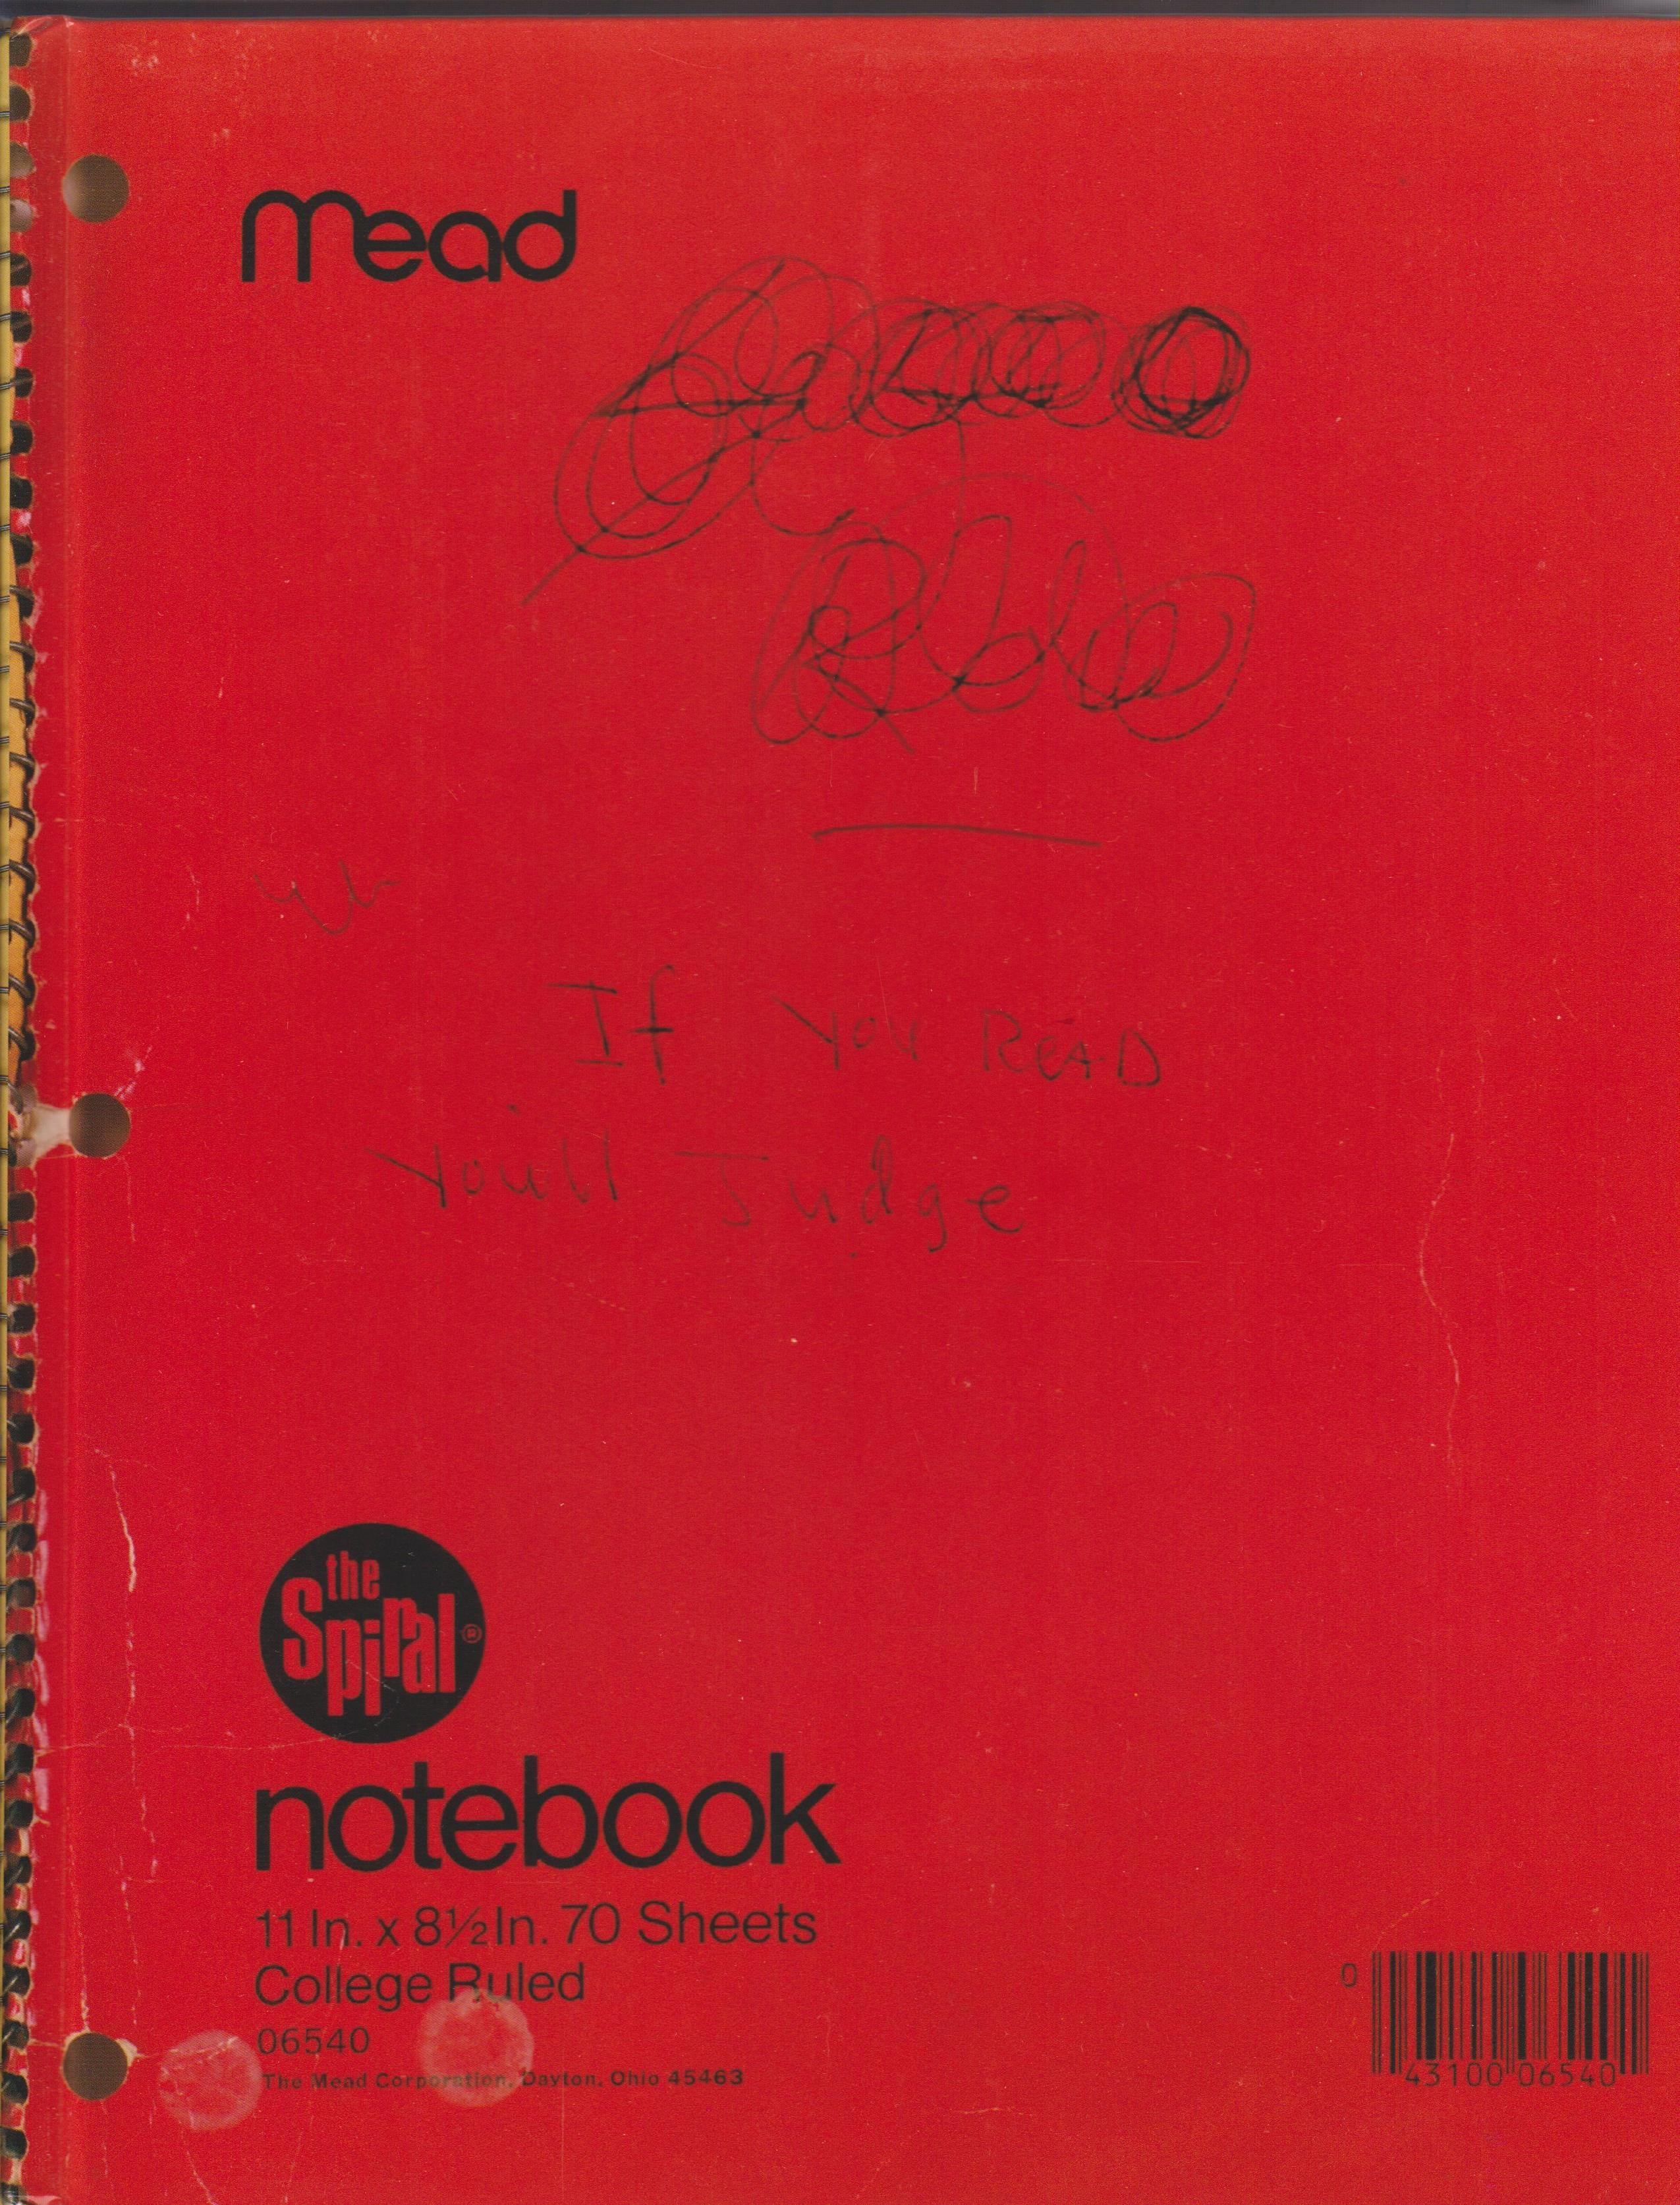 Cobain Journals